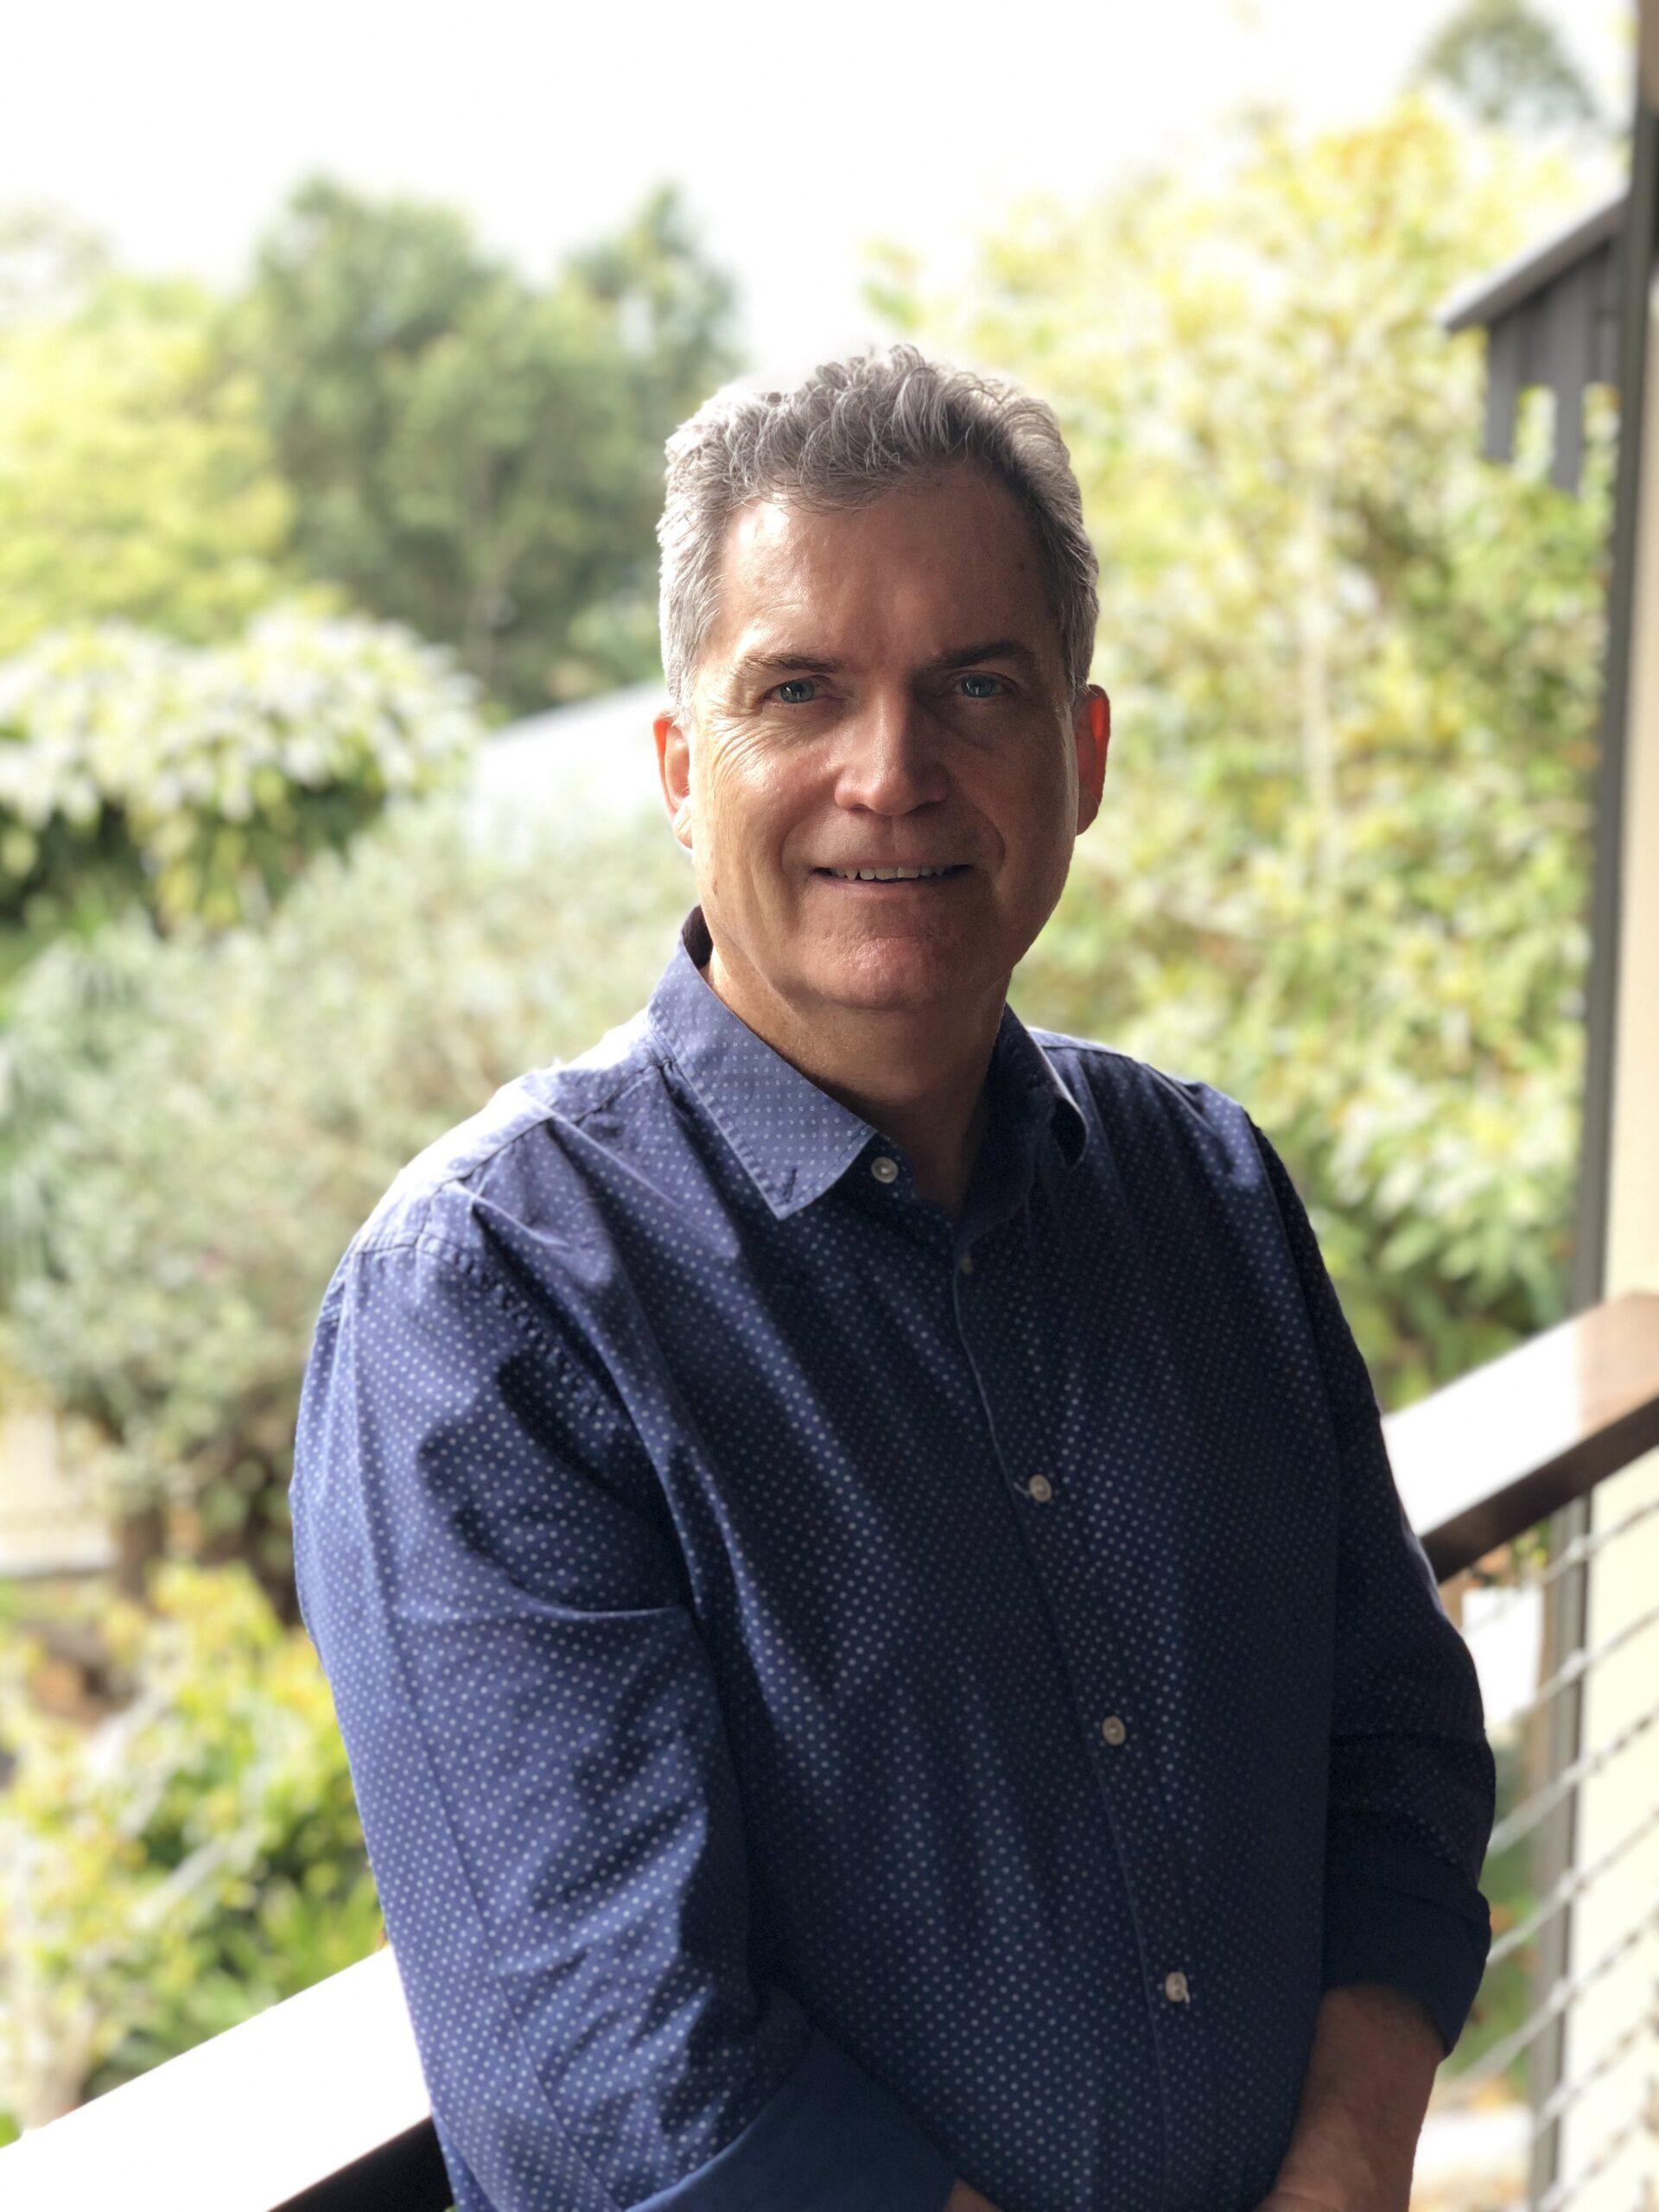 Gregory Harper